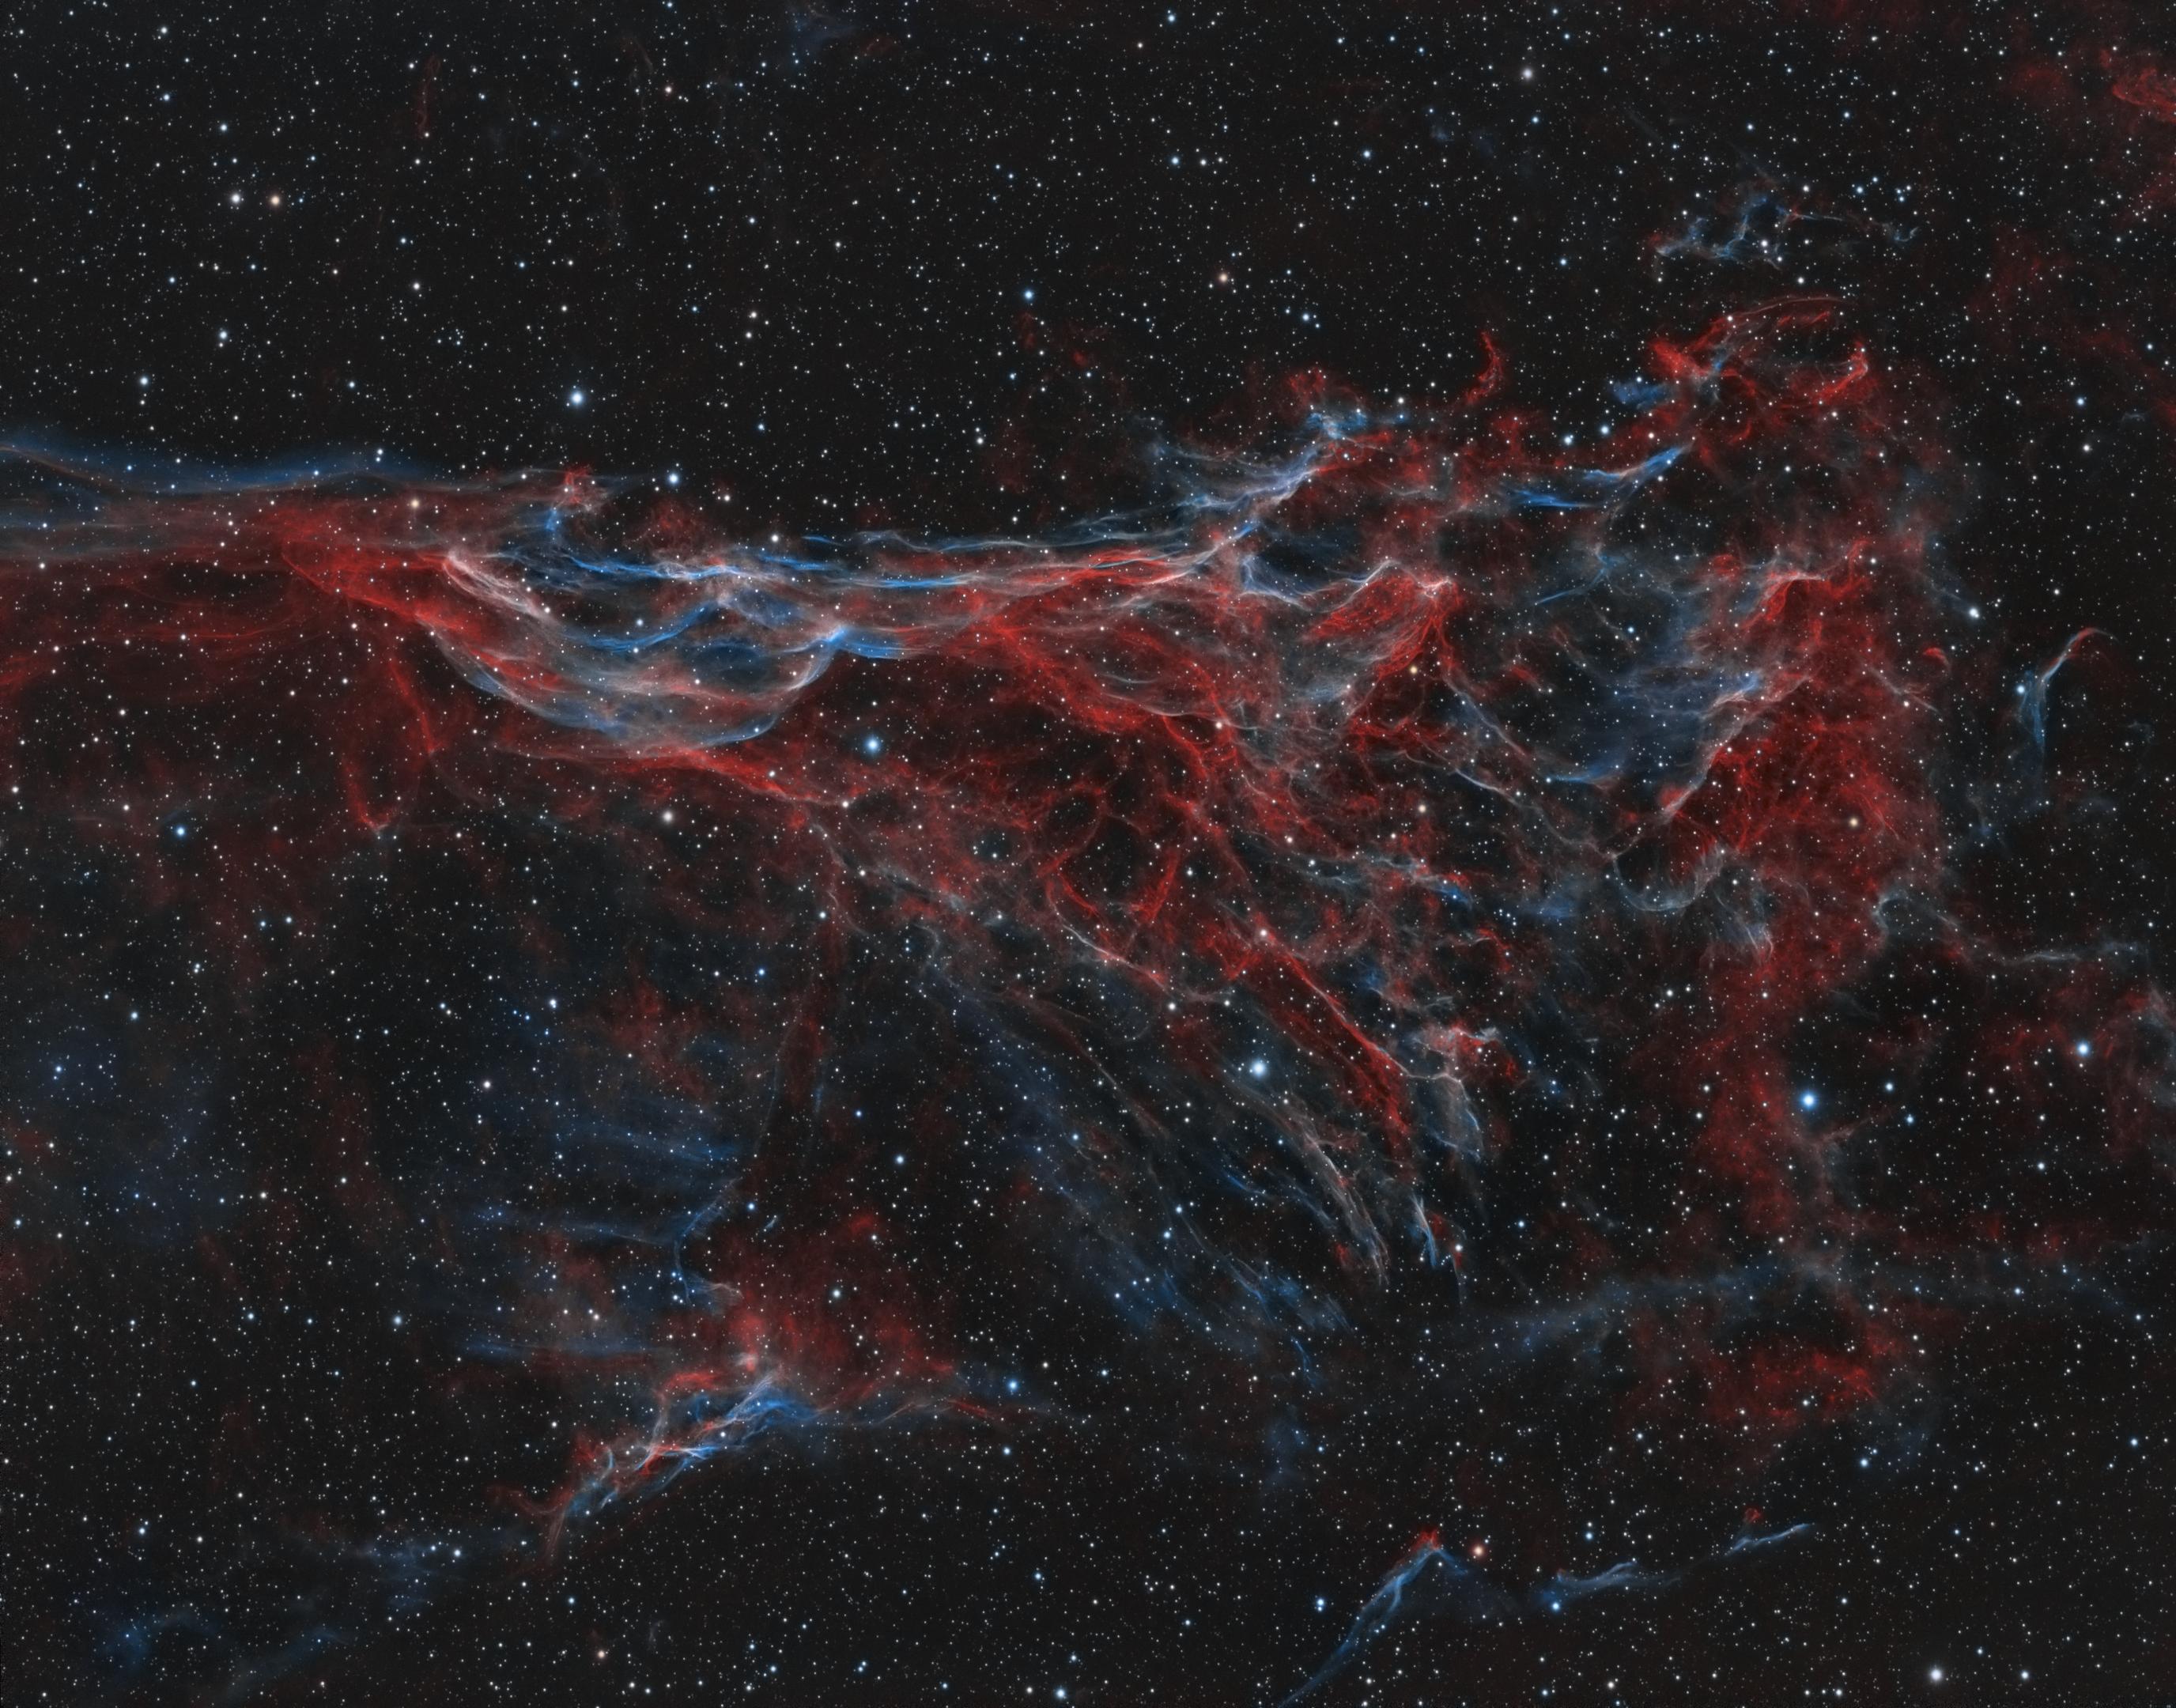 NGC6979_bicolor_koniec_last-v  Telescope: TEC140 f/5.2  Camera: QHY695A  Mount: Paramount MyT  Exposure: (Ha,OII) 13,5h Ha 33x900s , OIII 21x900s binx1  Date and place: 08.2018 Ochojno, Poland